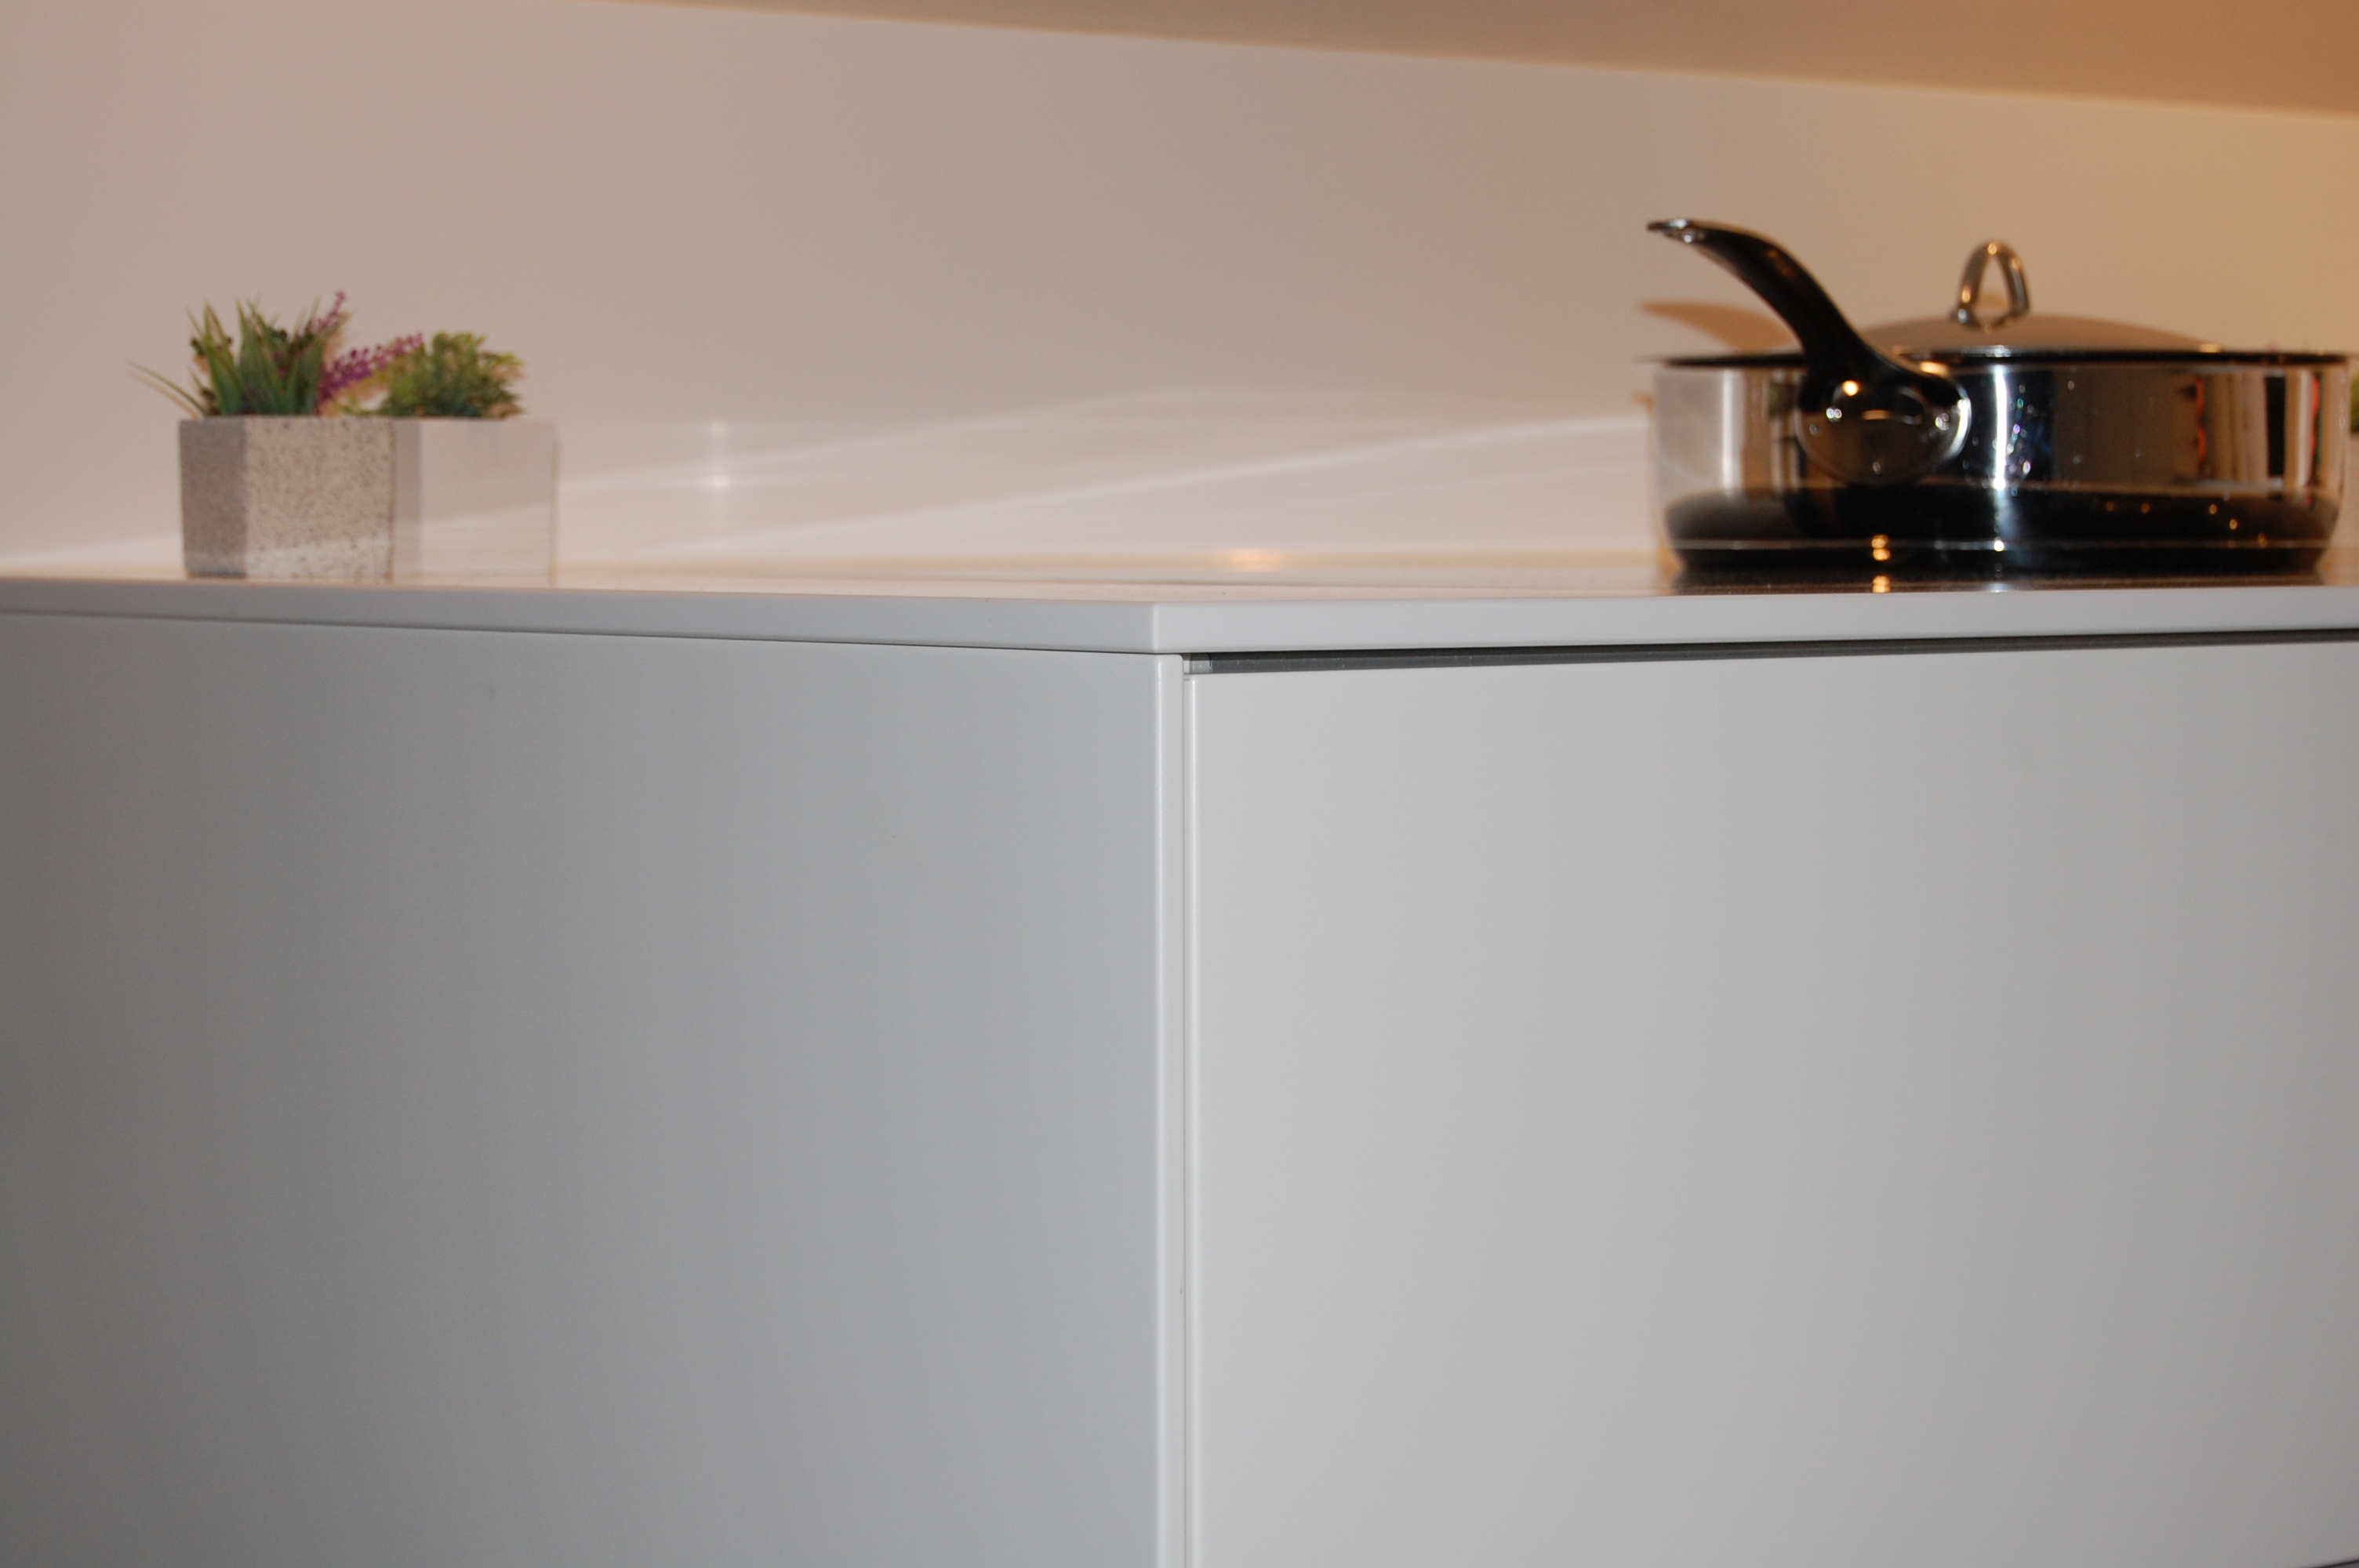 Keuken Wandkast 5 : Keukens hl keukens en kasten